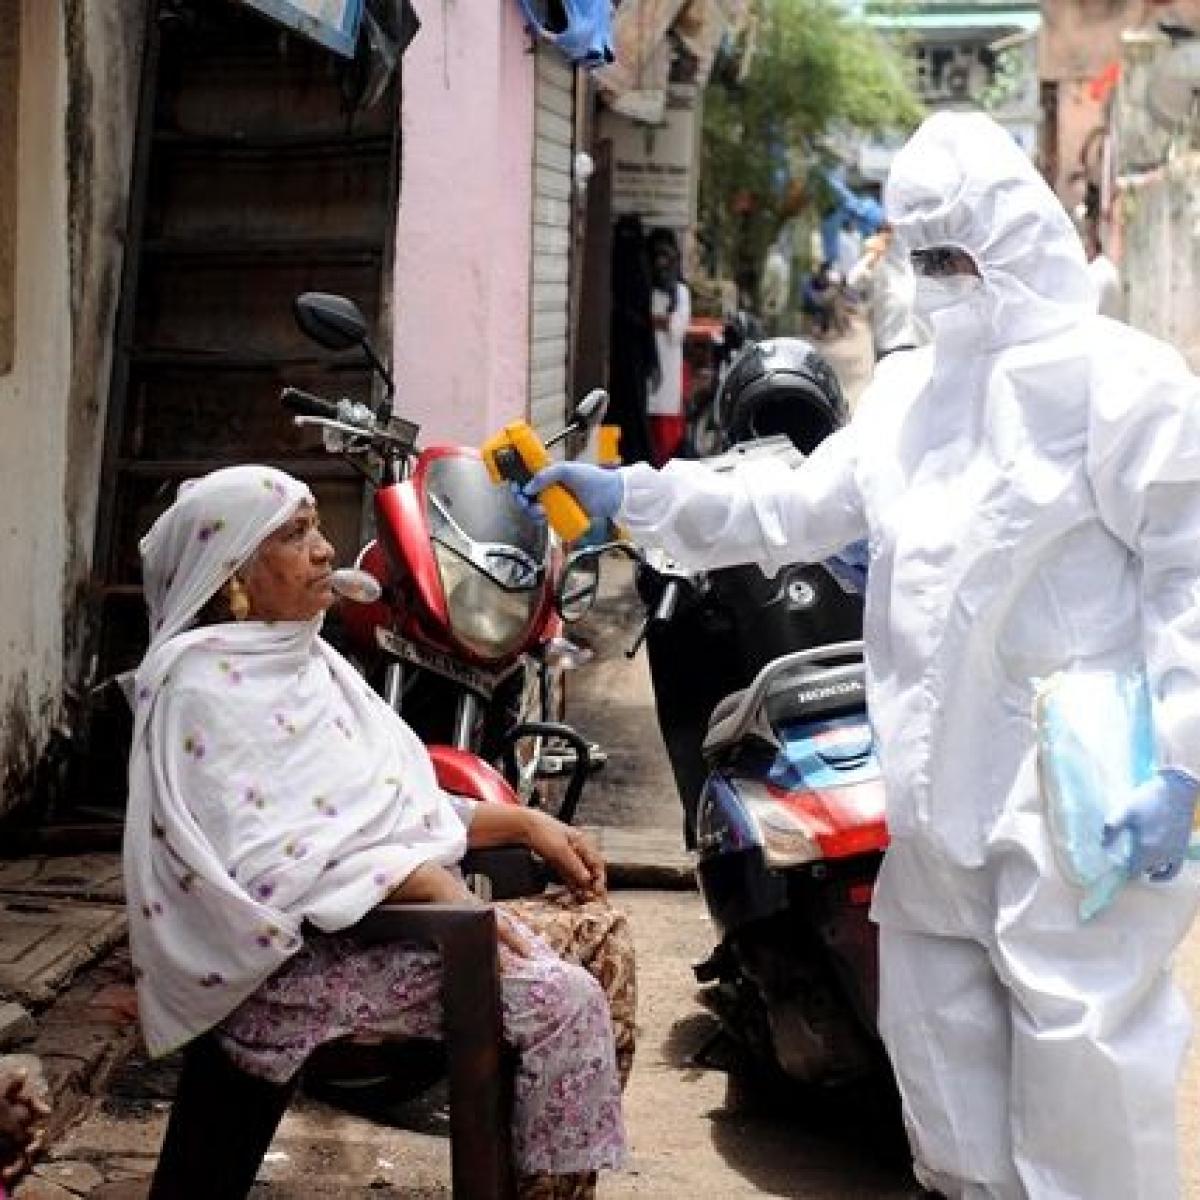 Coronavirus latest updates: India's COVID-19 tally crosses 19-lakh mark, records 52,509 new cases